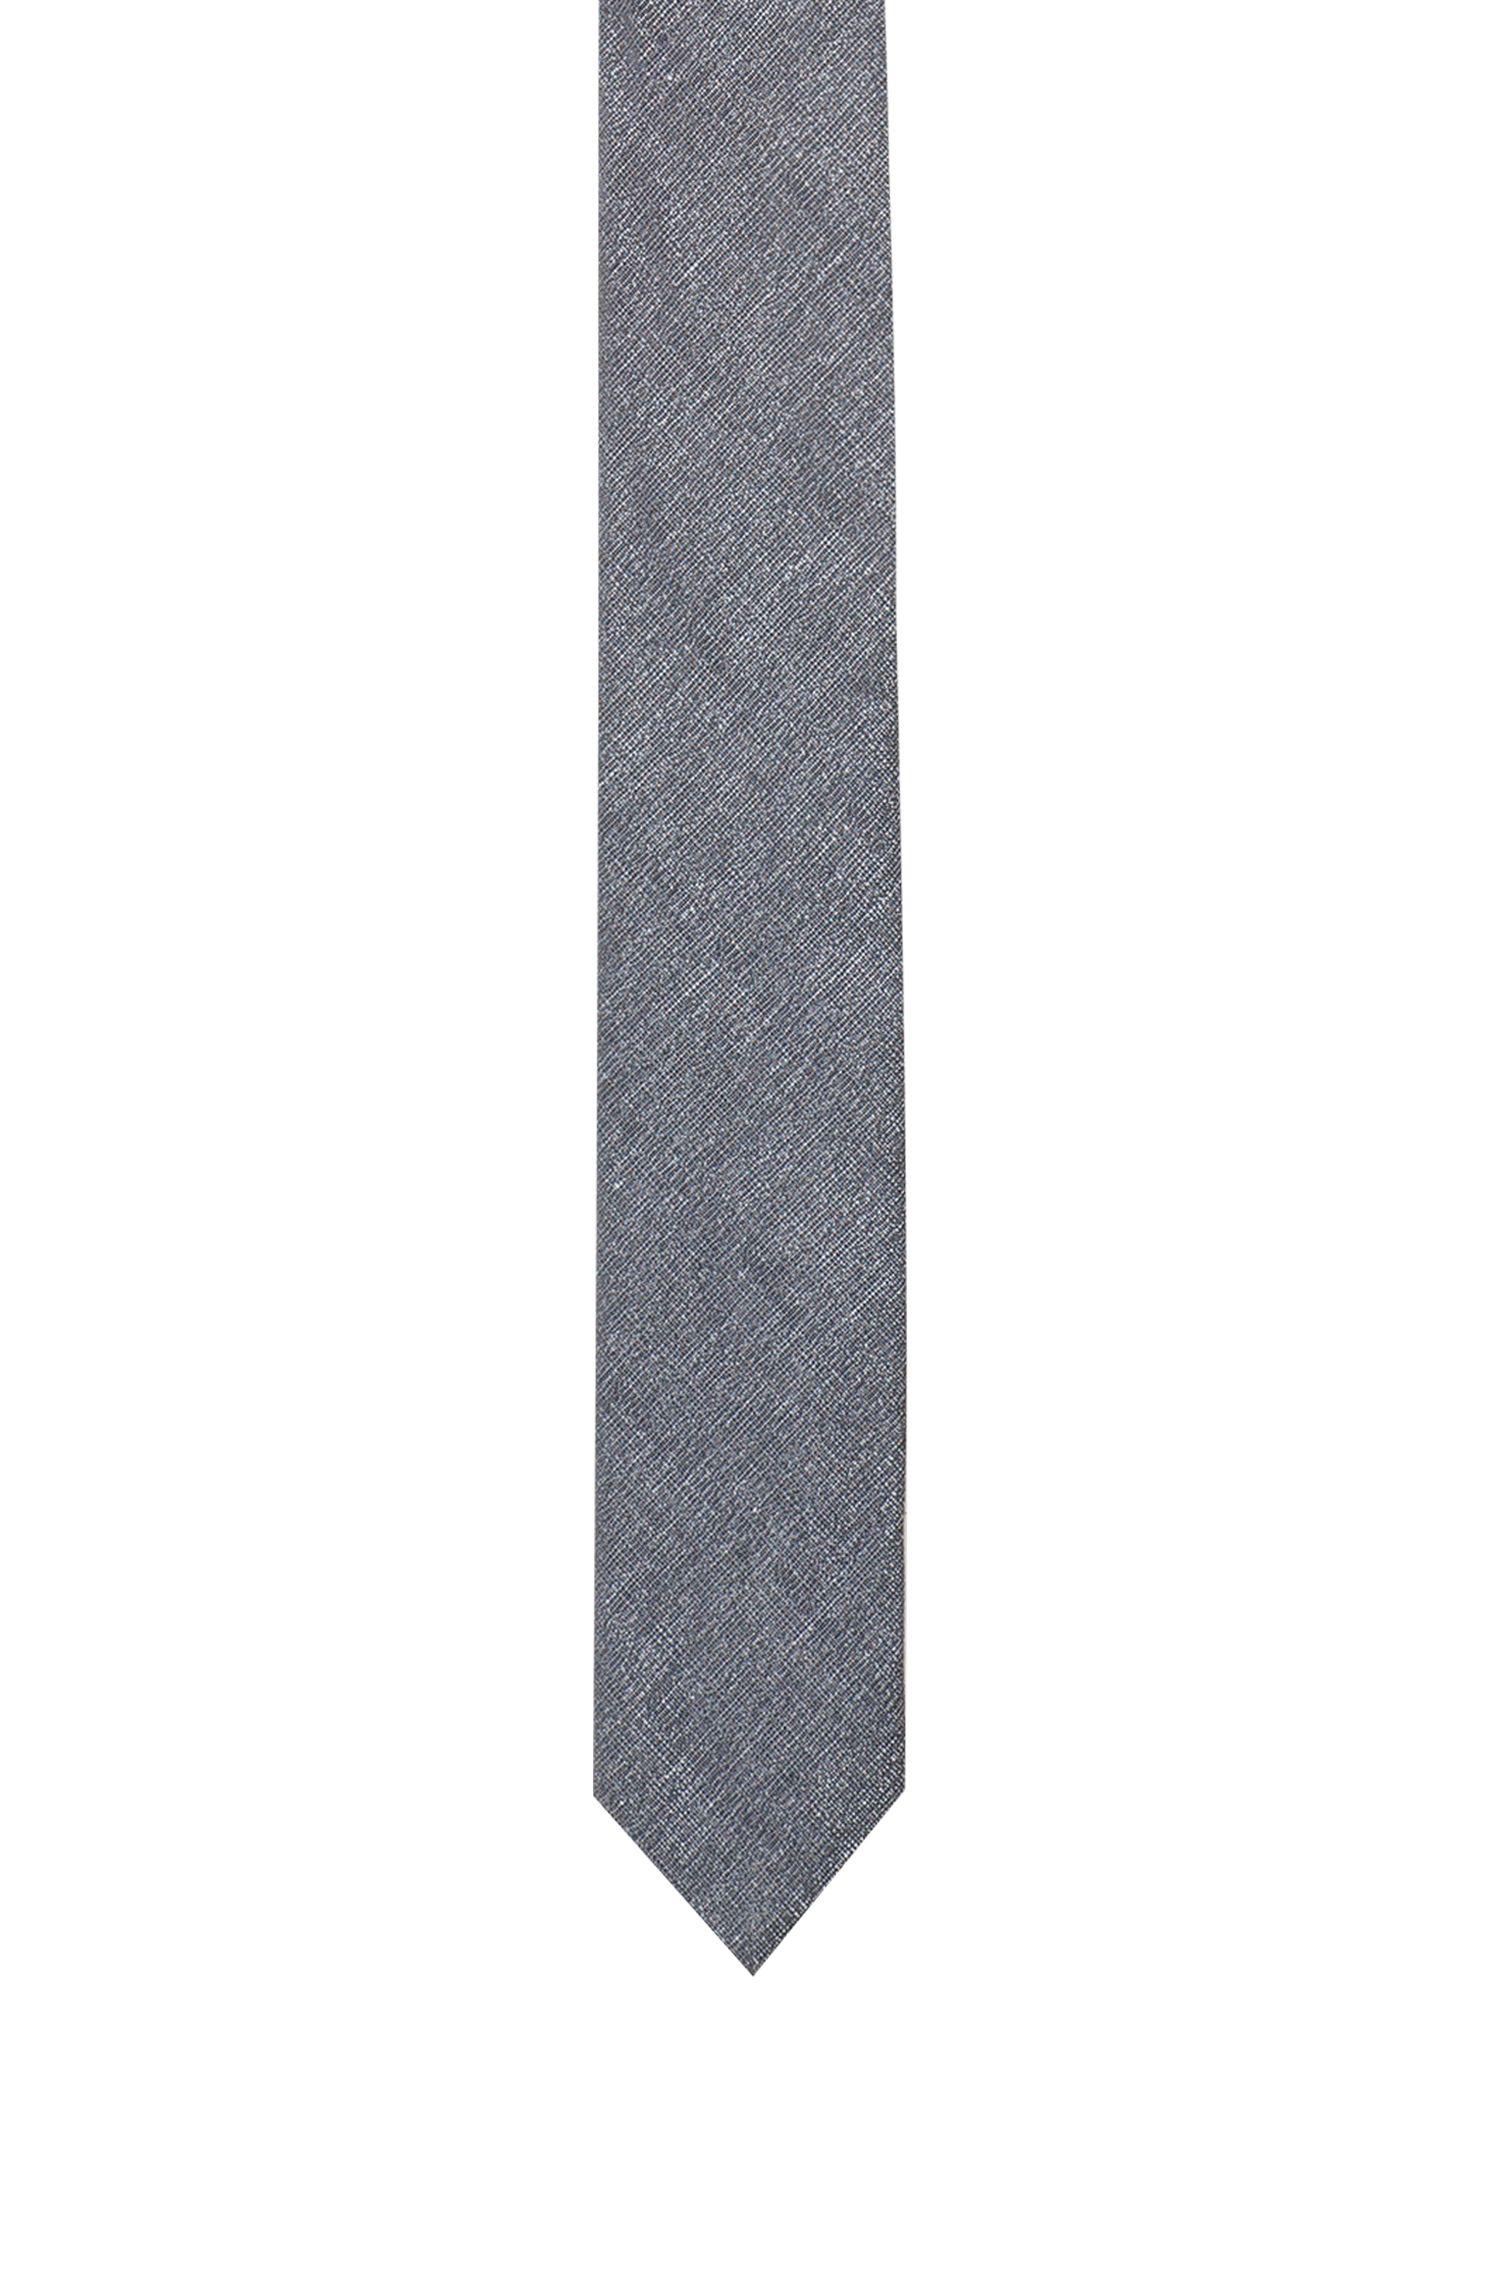 Jacquard tie in a linen blend